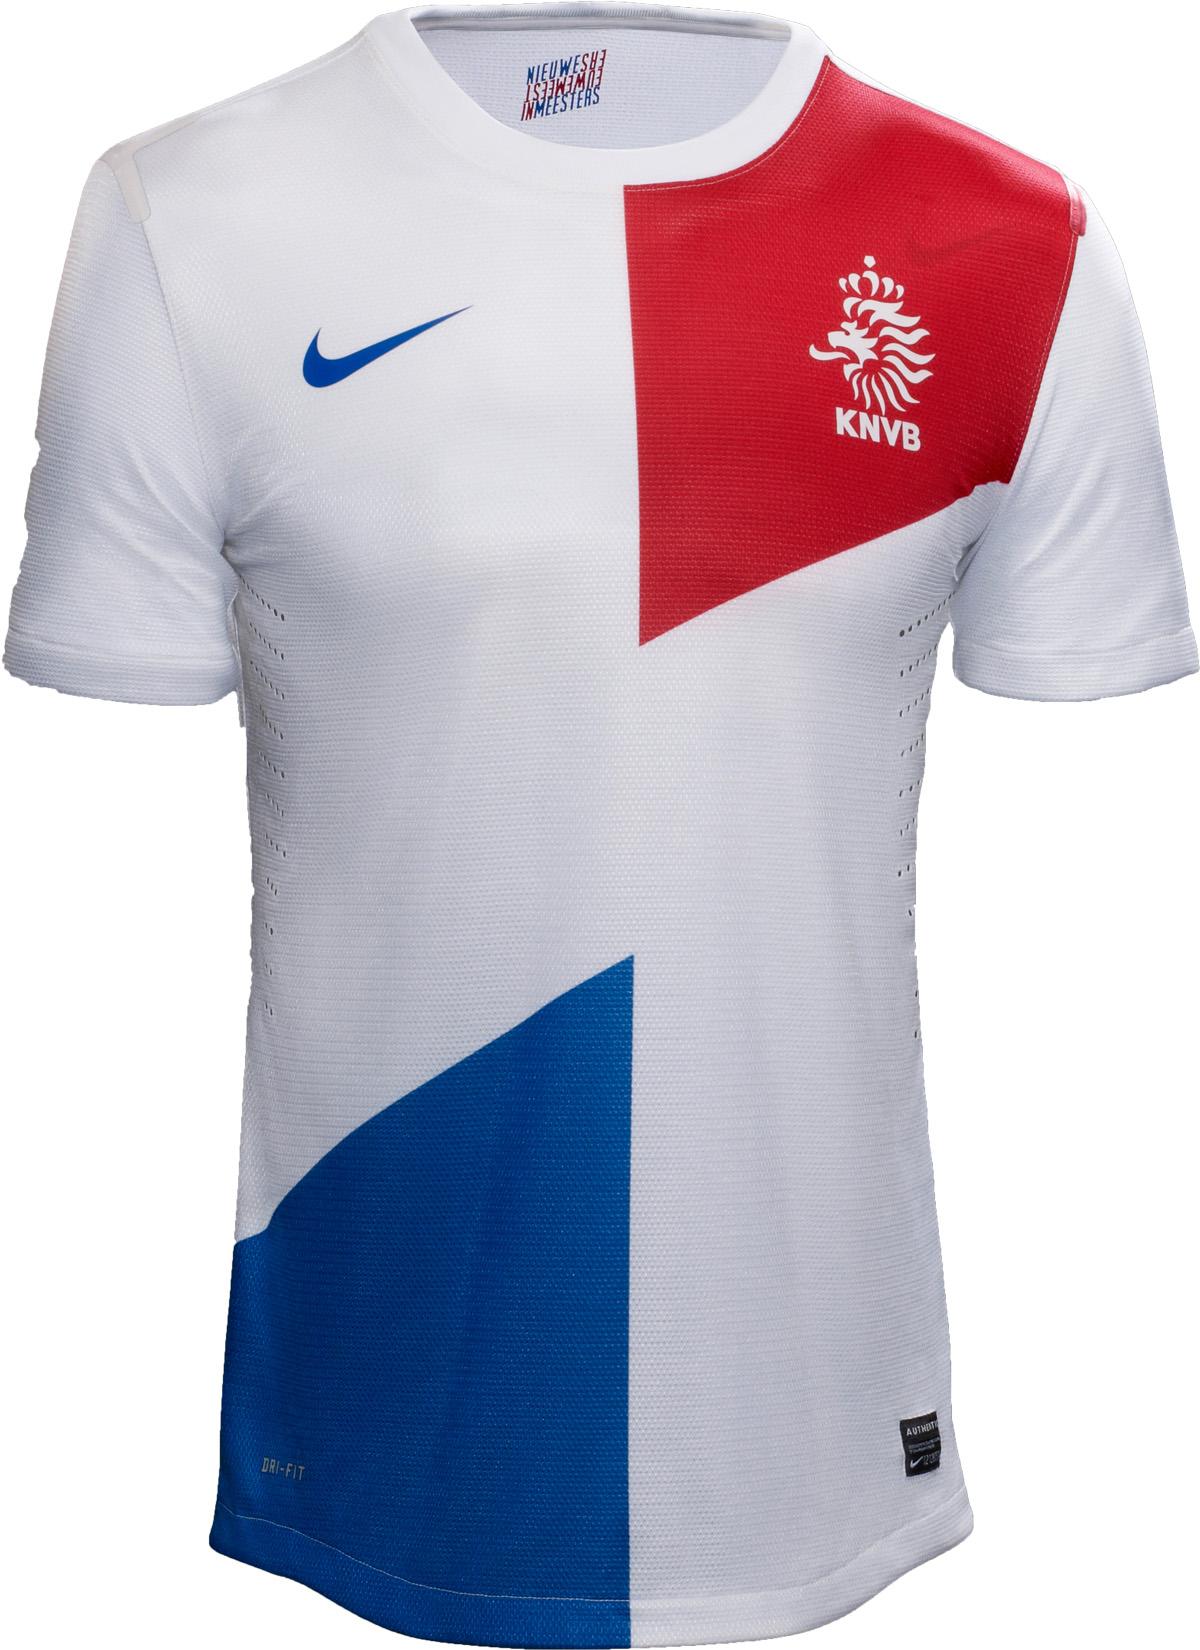 Nike_Football_Holland_Away_Jersey_1_original.jpg